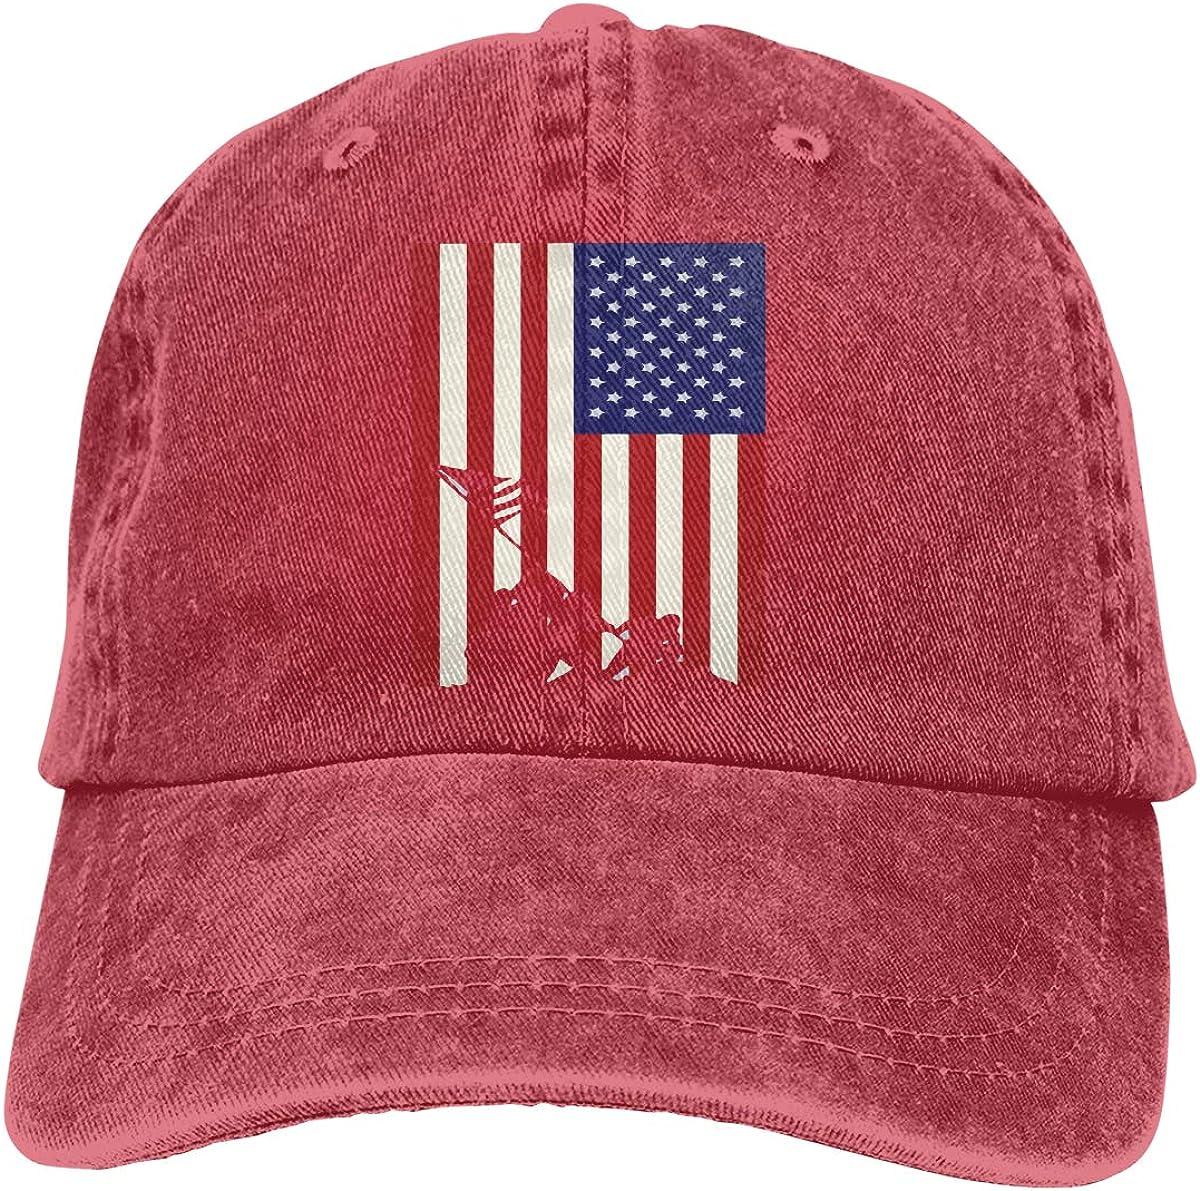 Iwo Jima Adult Custom Cowboy Hat Casquette Adjustable Baseball Cap